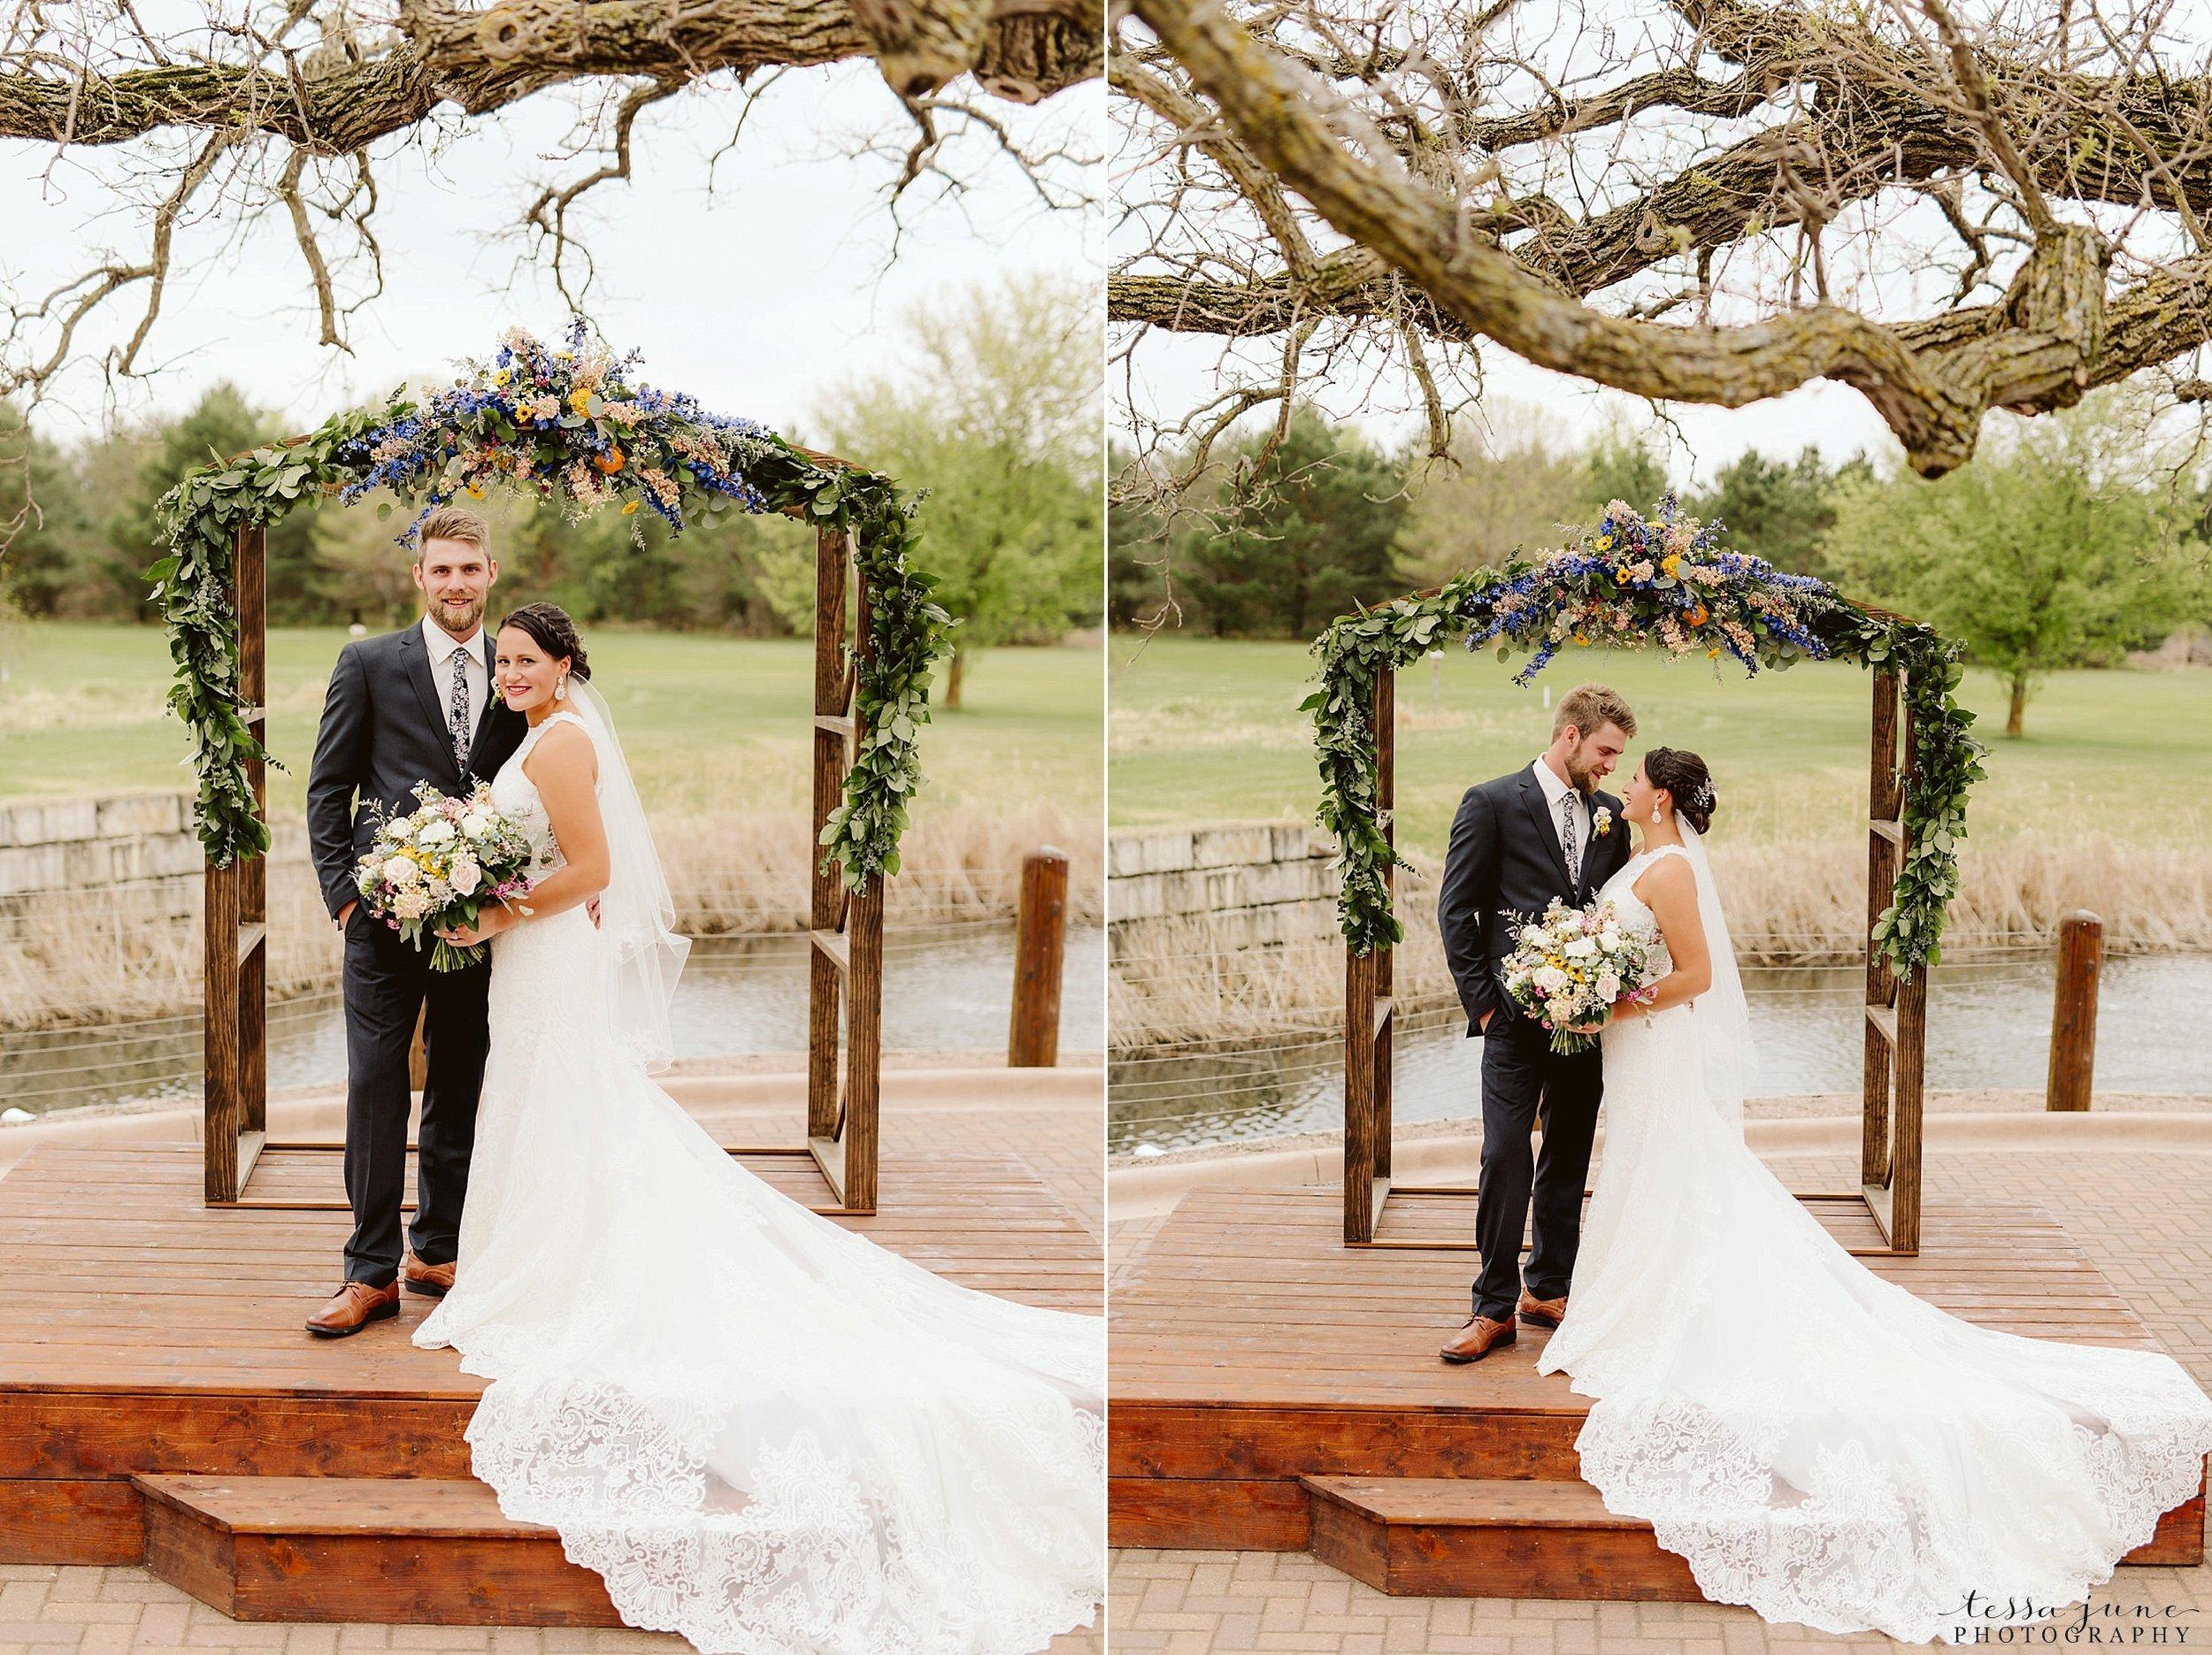 The-grands-at-mulligans-wedding-sartell-minnesota-spring-floral-spring-garden-wedding-43.jpg